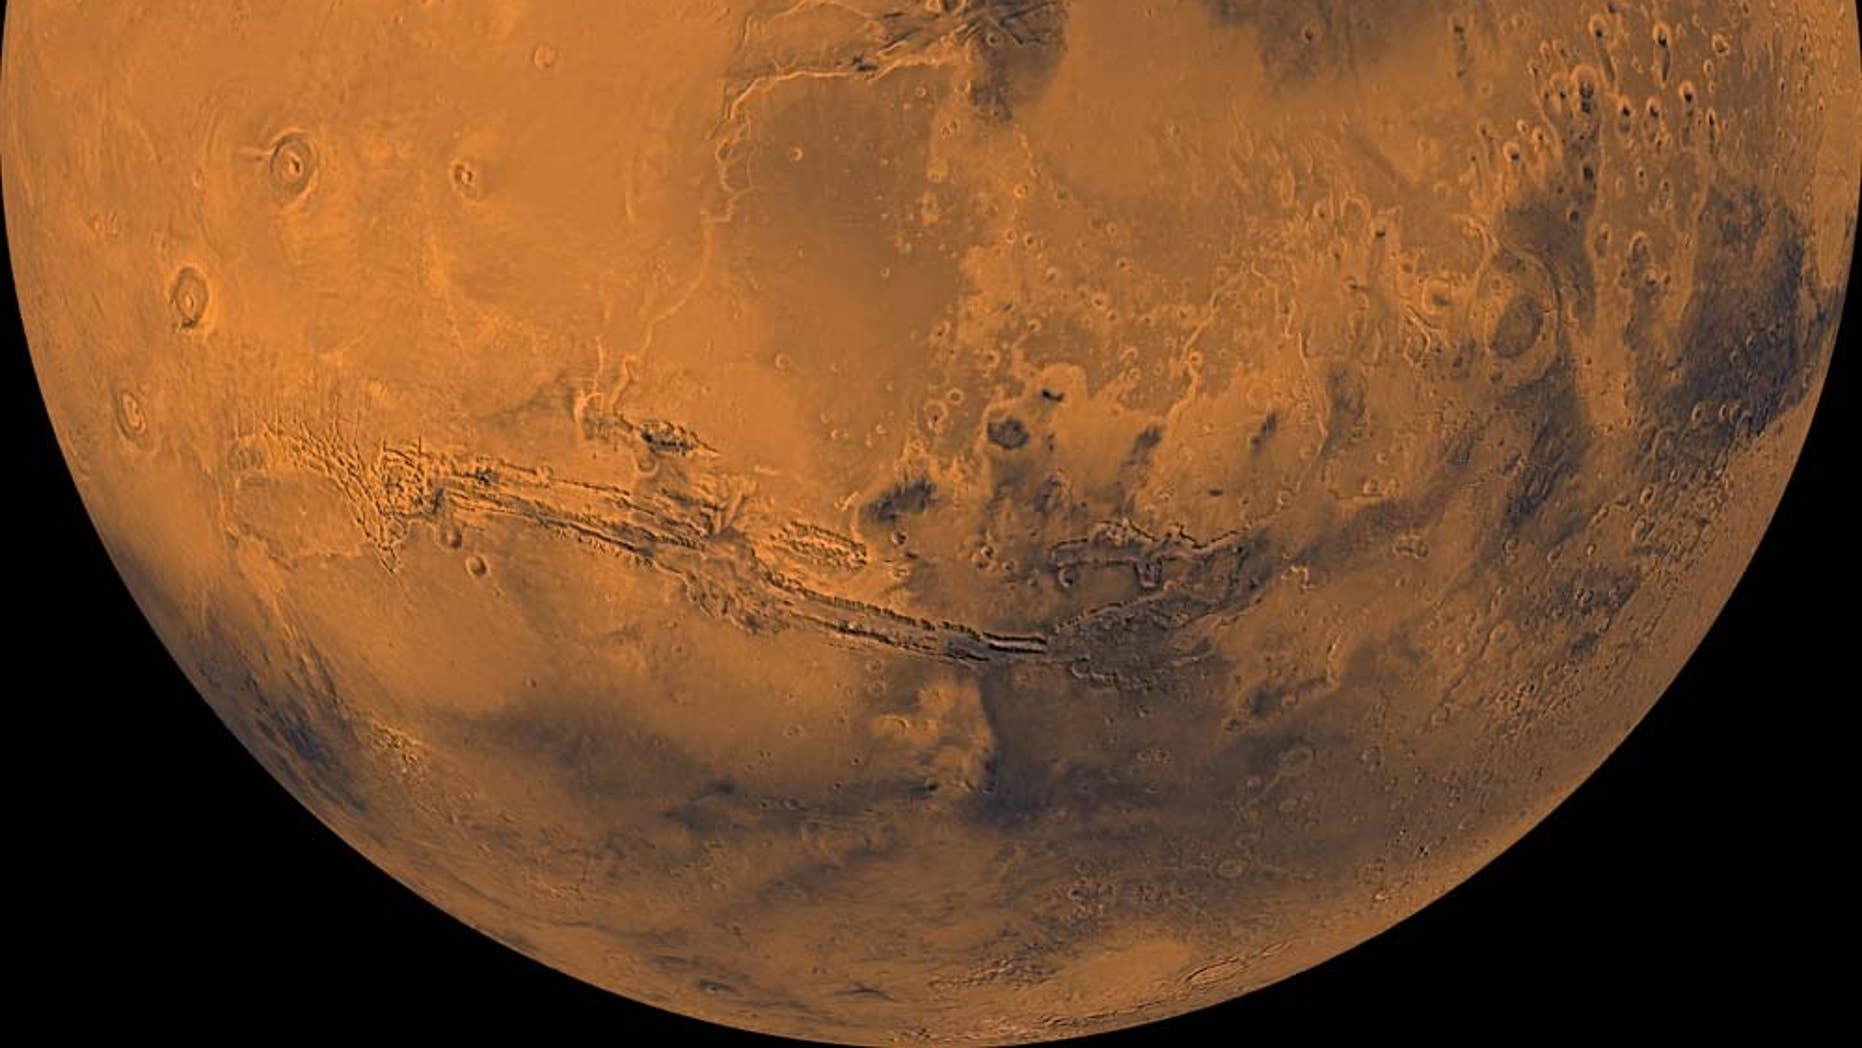 Mars, as imaged by NASA's Viking 1 orbiter in the 1970s.